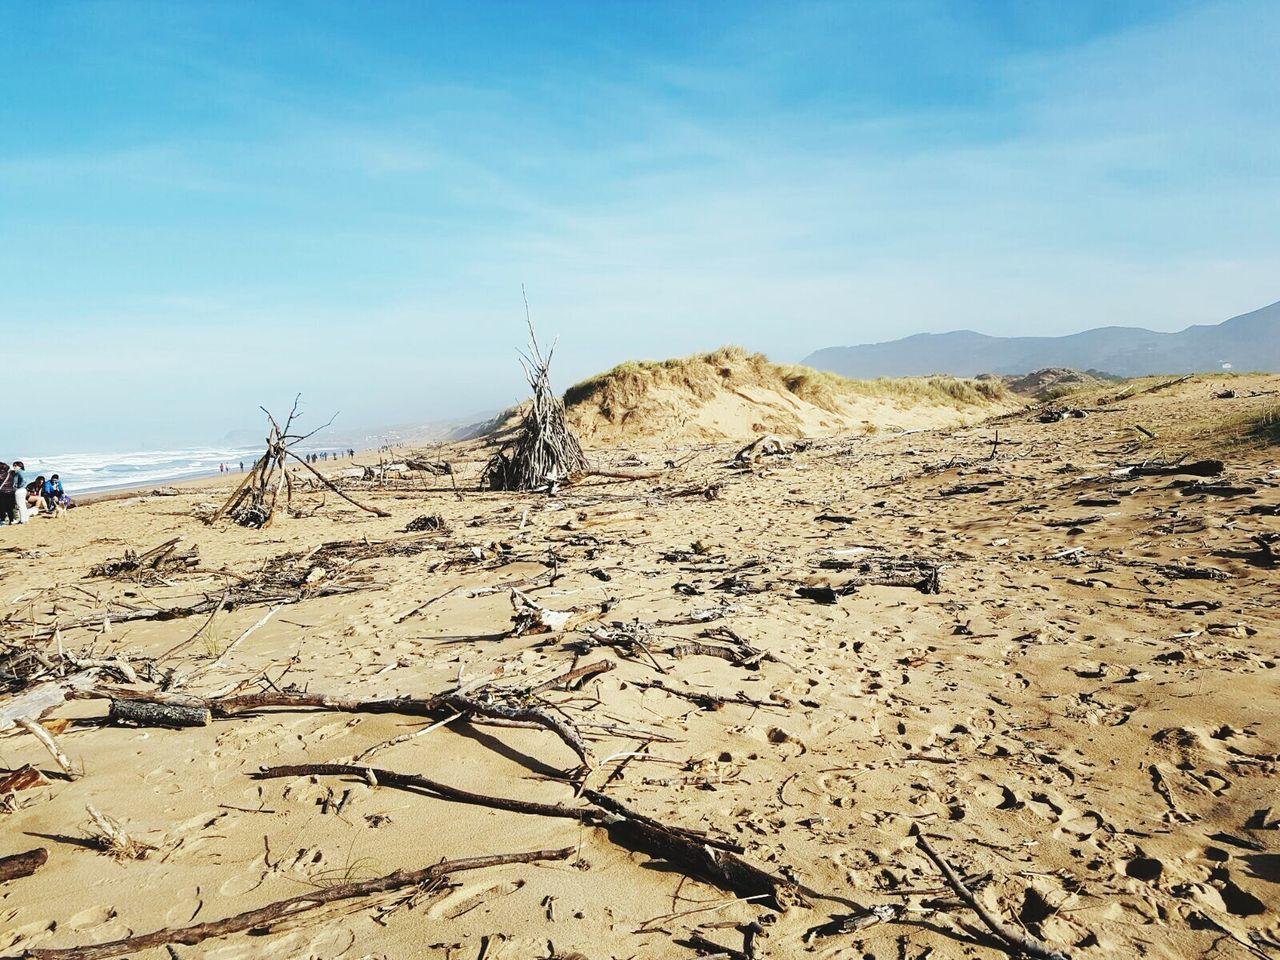 Sunny Day Landscape Arbol Caido Desierto Deserts Around The World Dry Land Dunas Arid Climate Sand Nature Outdoors Beach